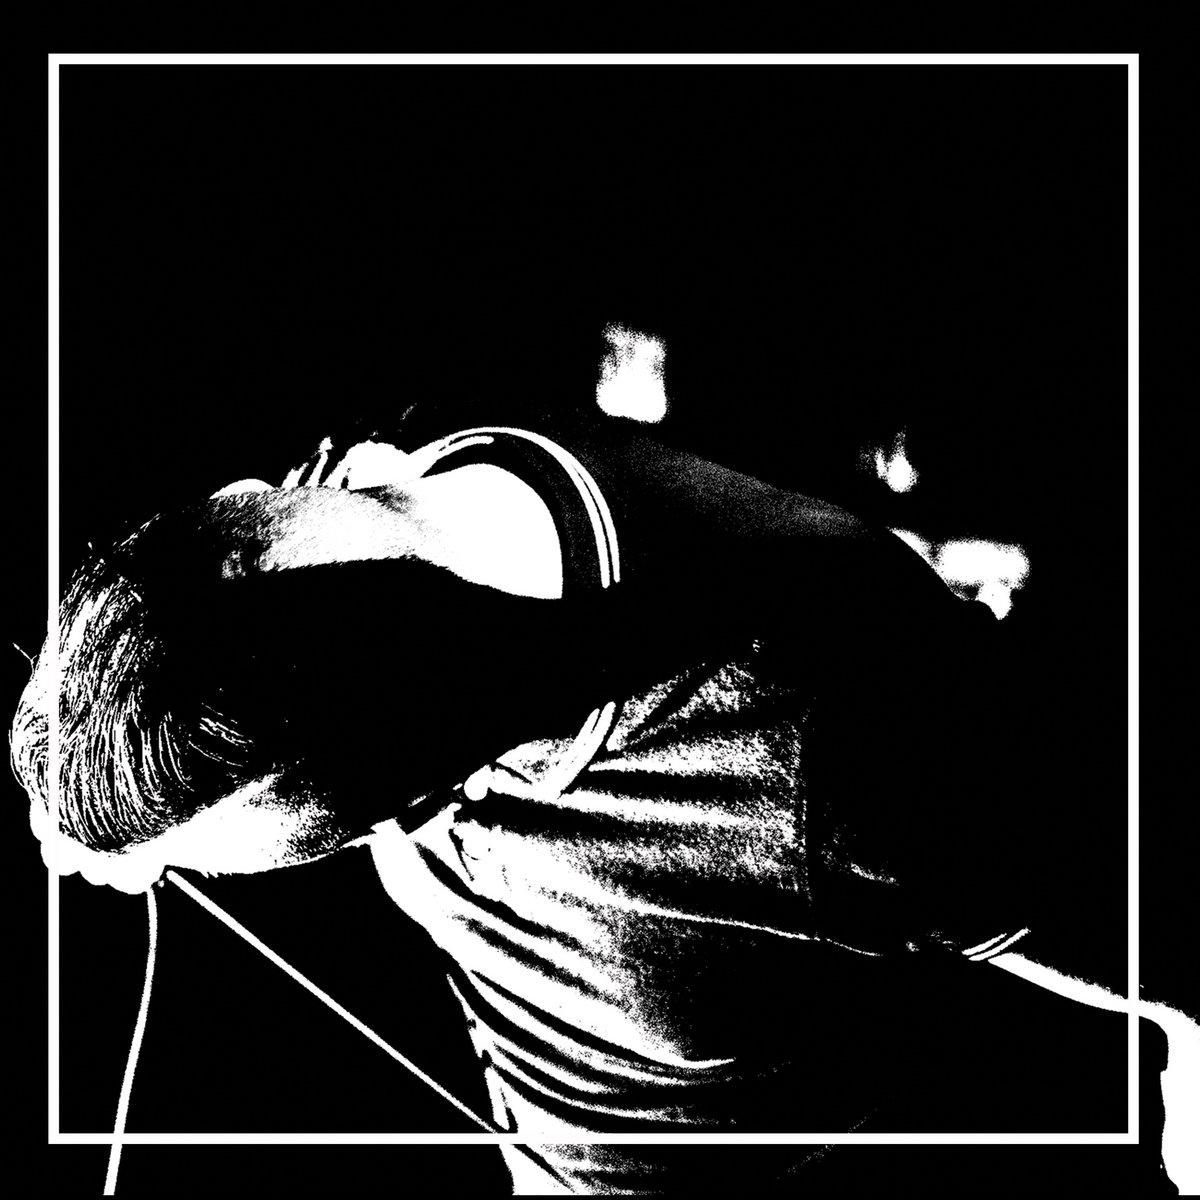 Axebreaker - Live Assault album cover